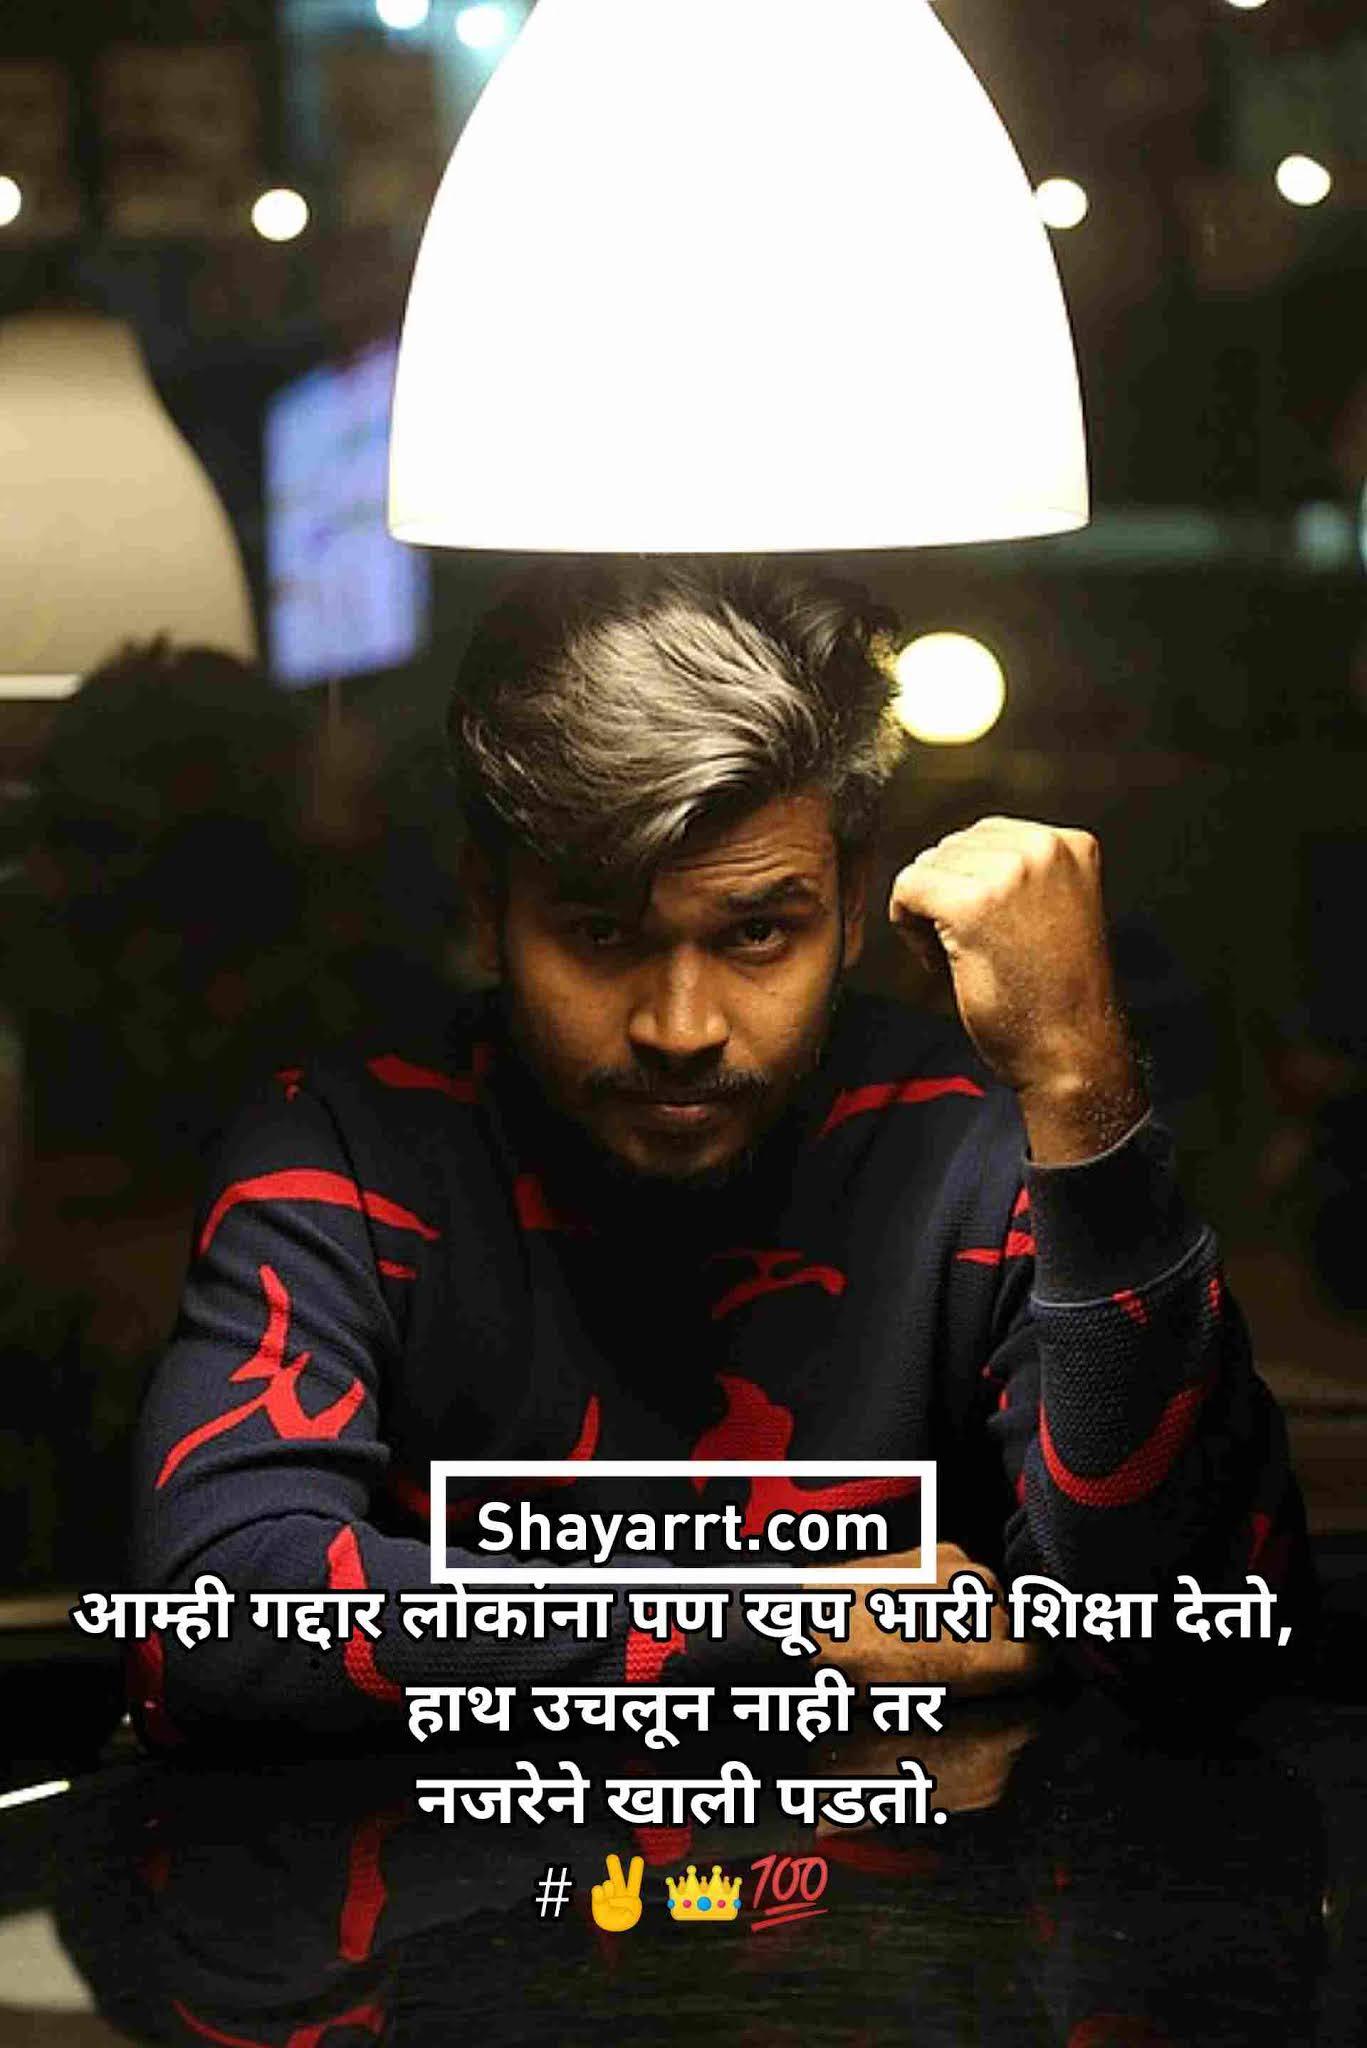 Attitude Shayari Marathi – एटीट्यूड शायरी मराठी में {Latest 200 + अकड़ Shayri in marathi}